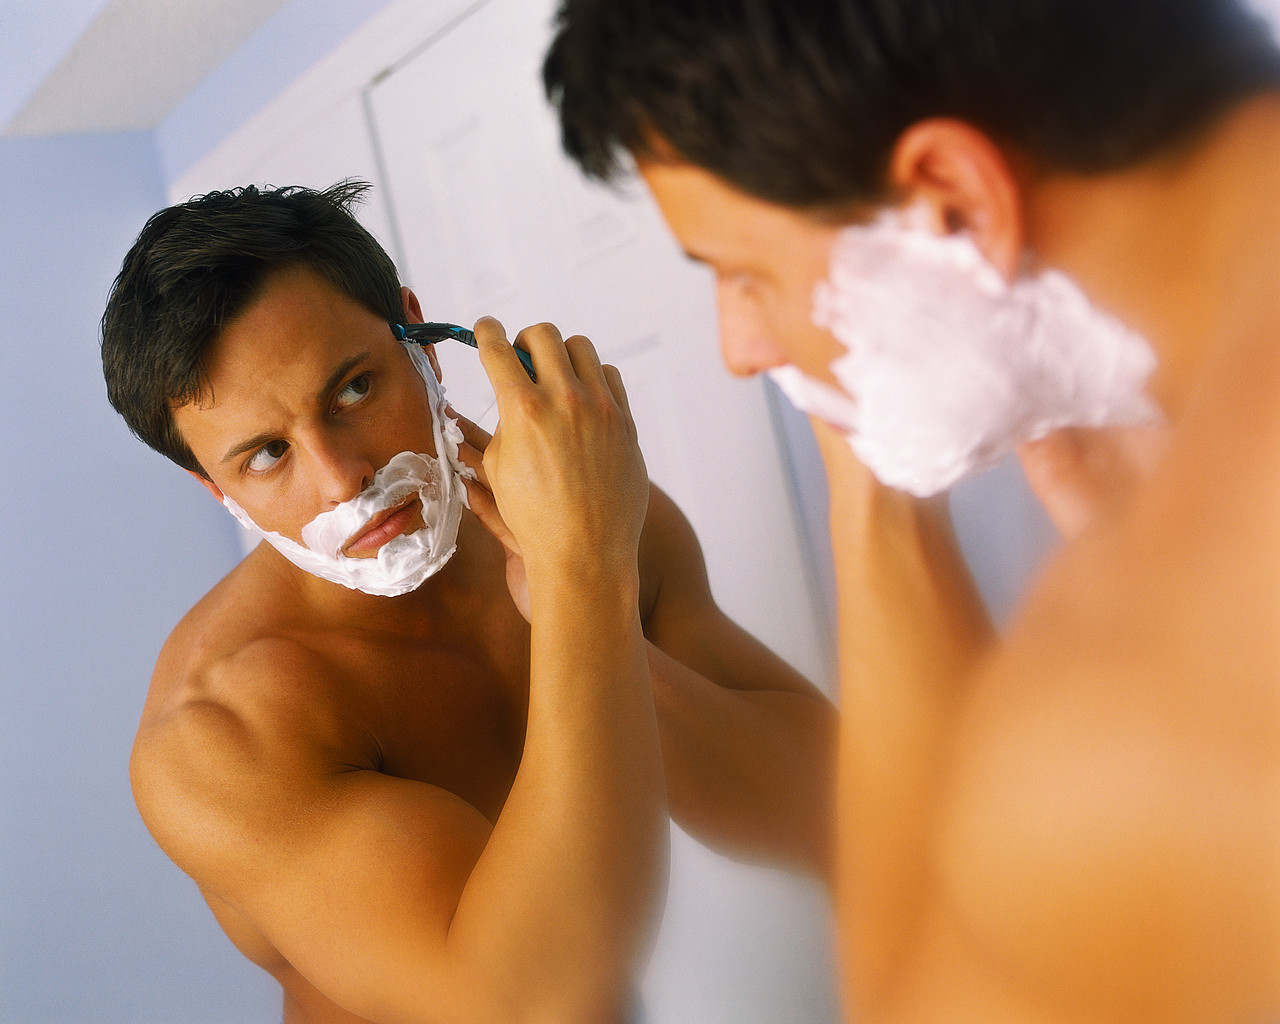 http://2.bp.blogspot.com/_Z4iX5vvg9jQ/TEkJXuOE6rI/AAAAAAAAAL0/RSASb2lMj7Y/s1600/shaving.jpg